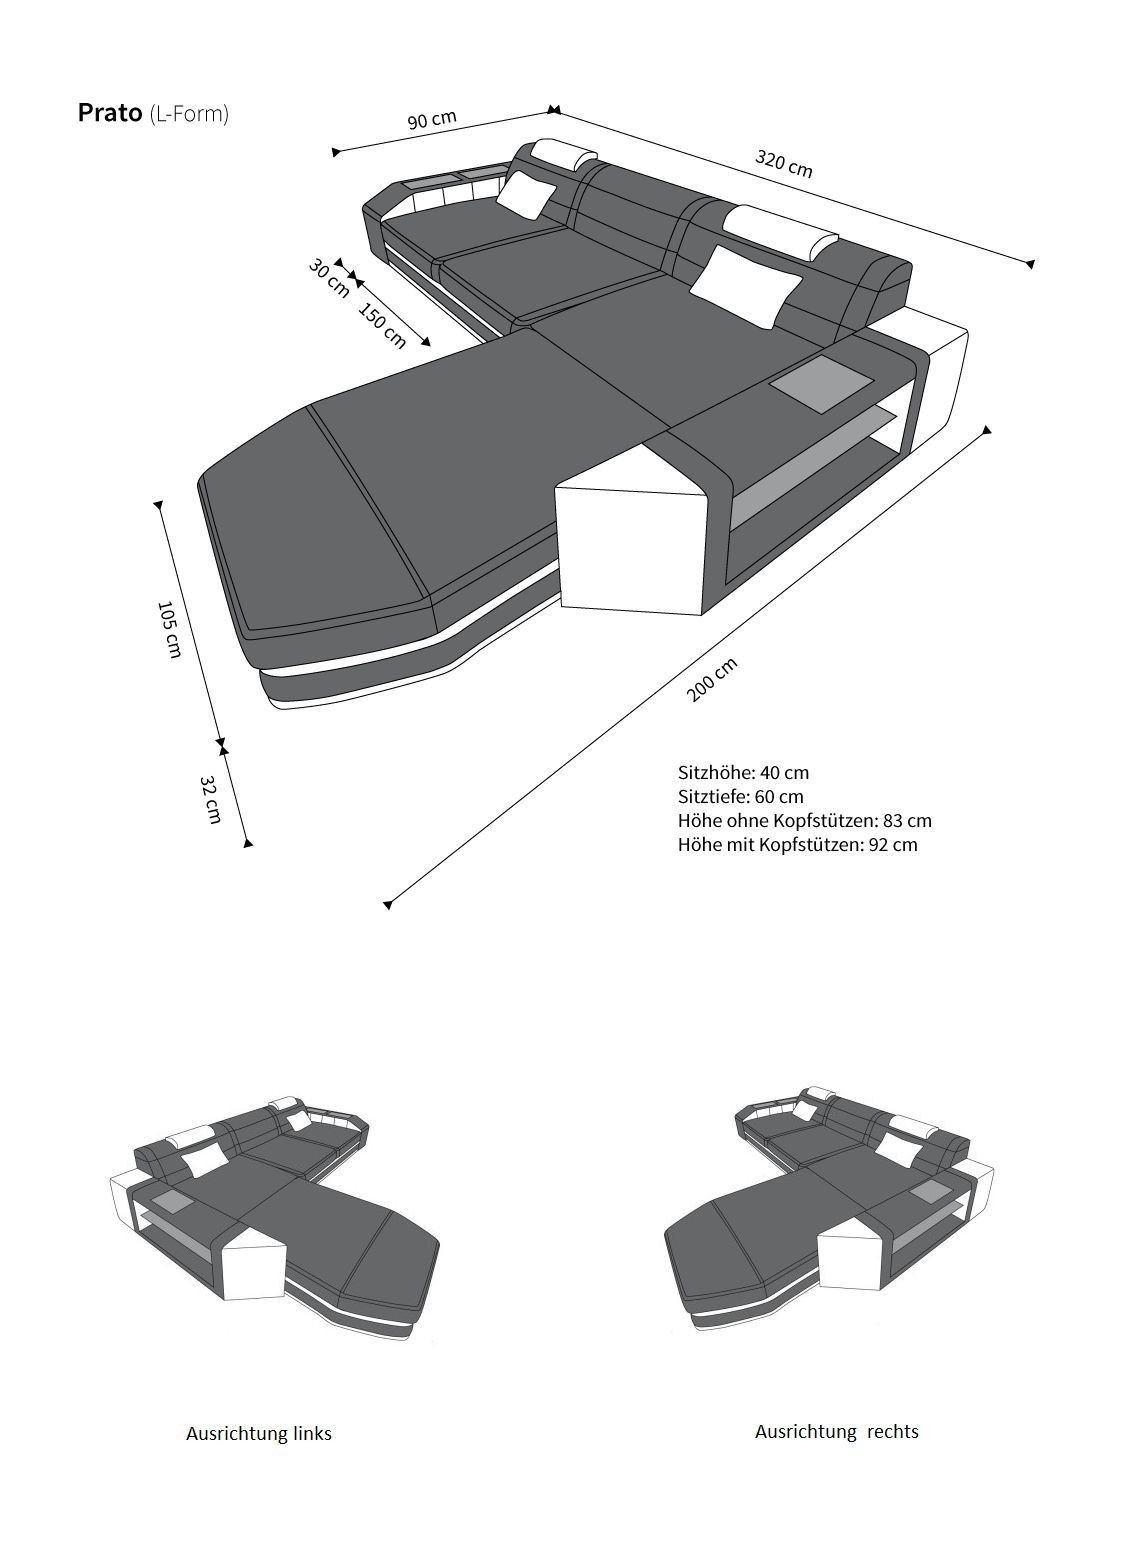 ledersofa prato l form in grau wei sofa mit kopfst tzen. Black Bedroom Furniture Sets. Home Design Ideas